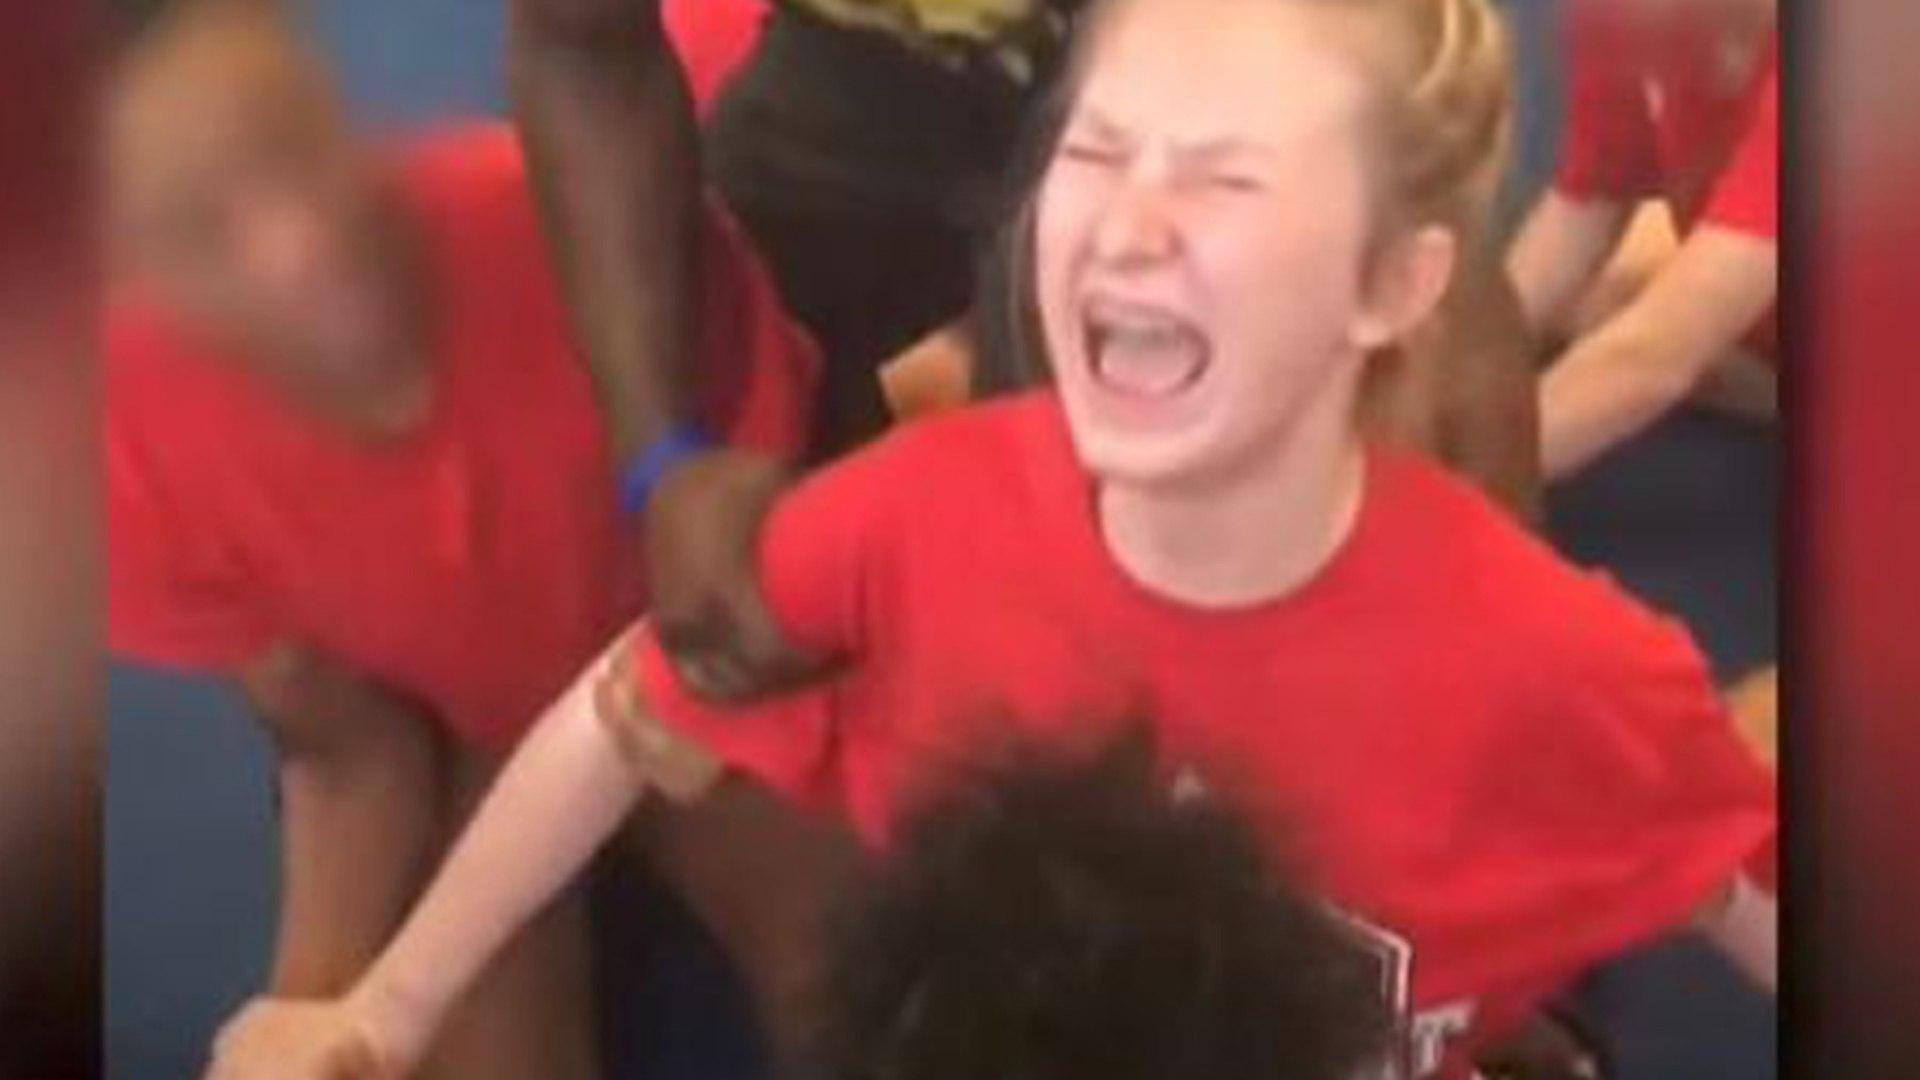 High School Cheerleaders SCREAM While Forced to Do Leg Splits